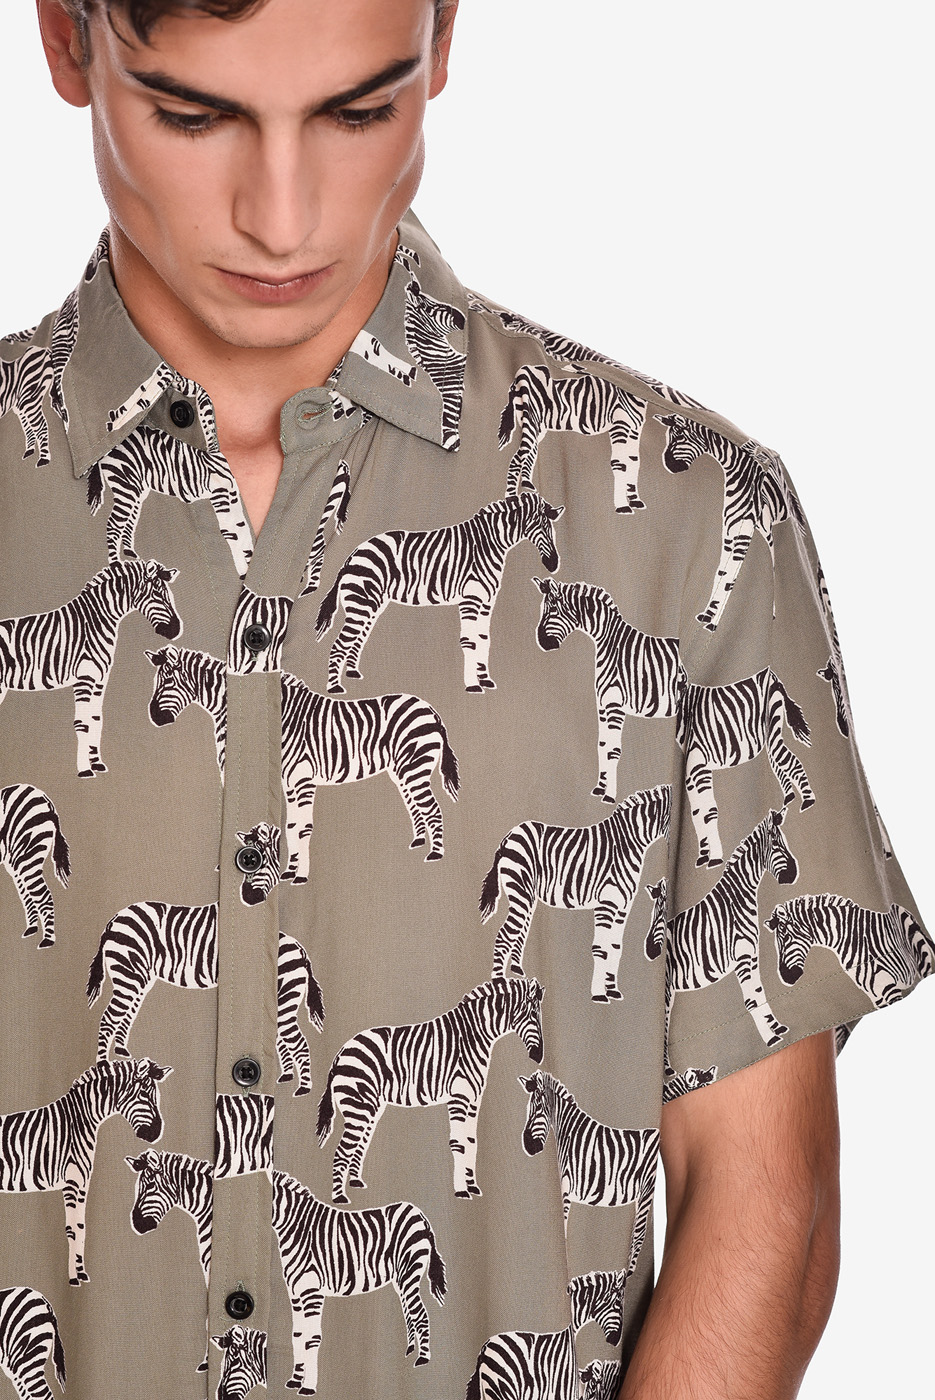 camisa-manga-corta-estampado-rock-cebra